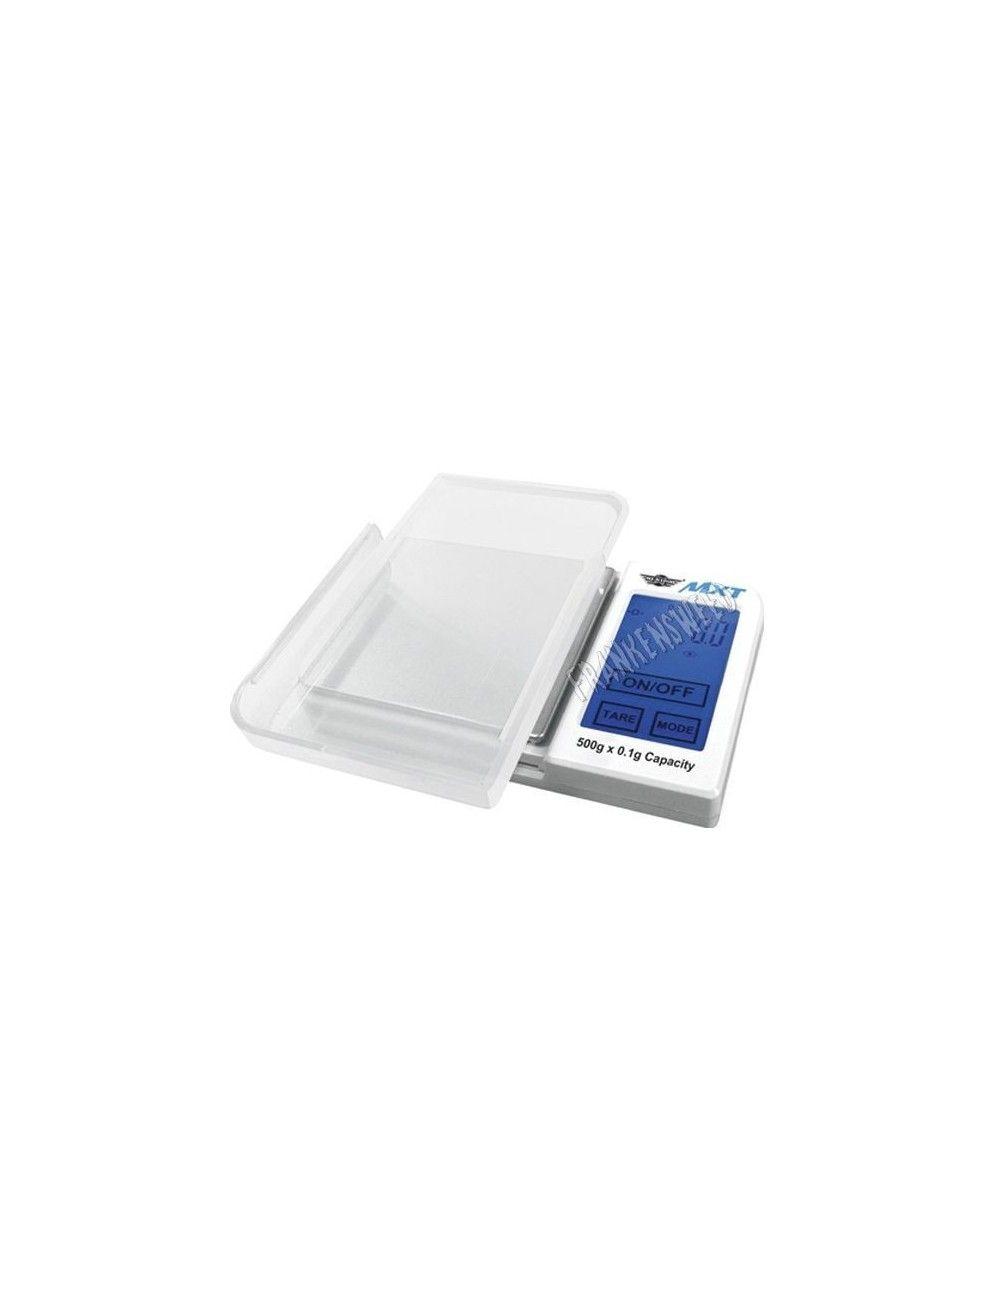 MXT 500 - 500g x 0.1g Mini-scale